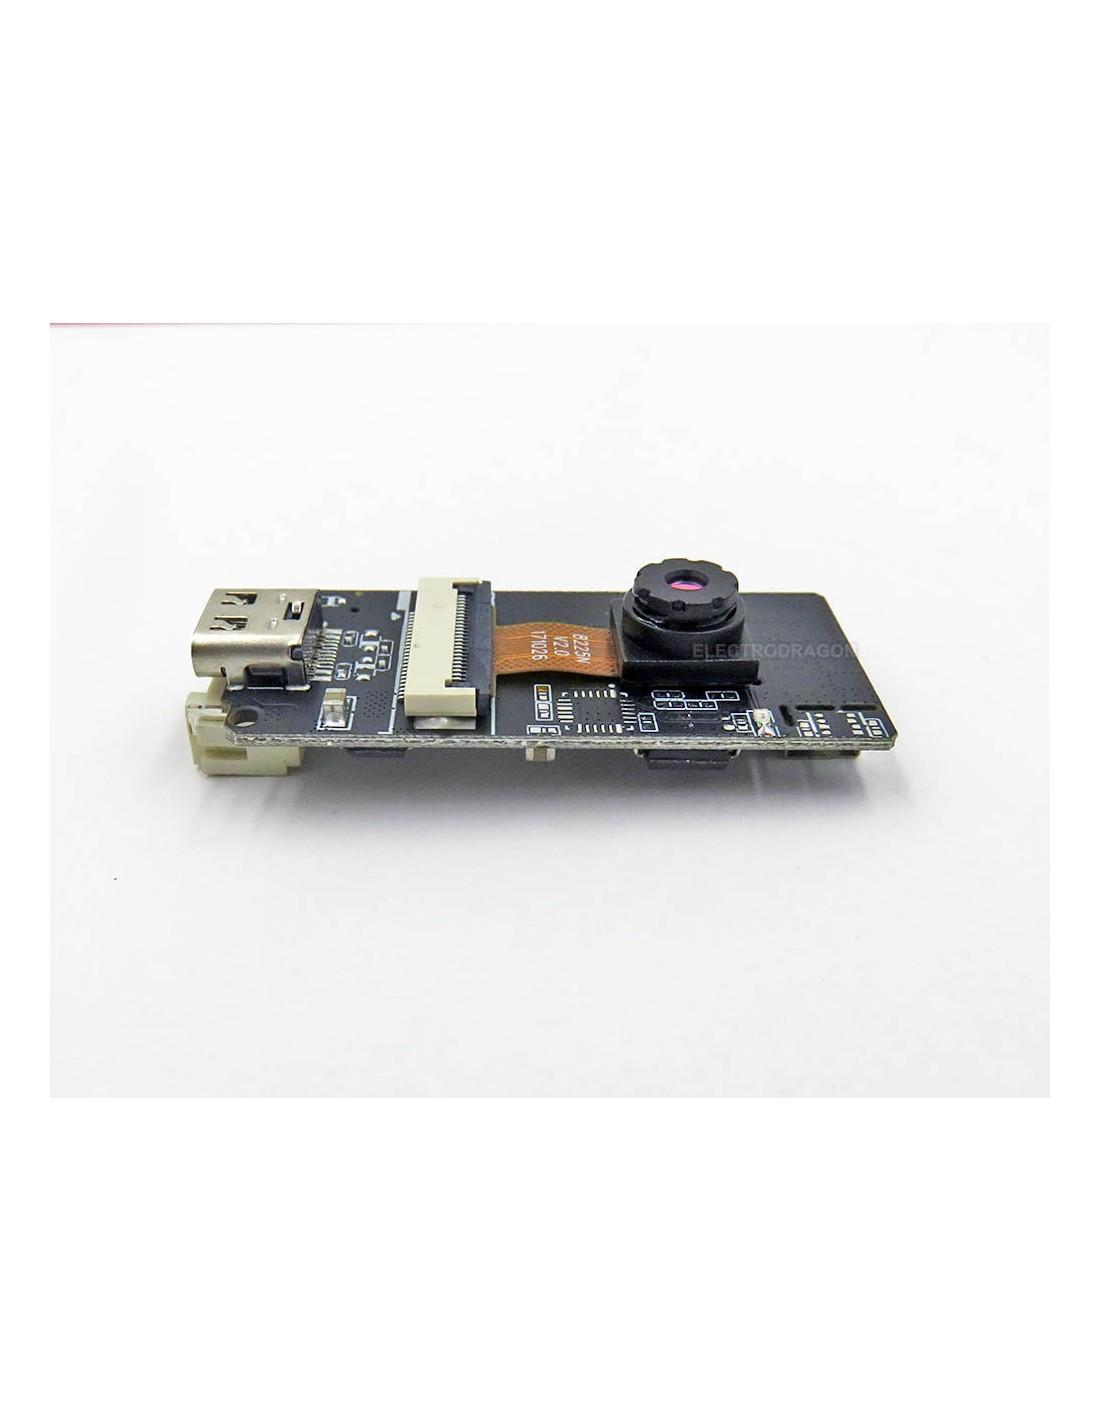 M5Stack PSRAM Camera Module with ESP32 WROVER MS02017 OV2640